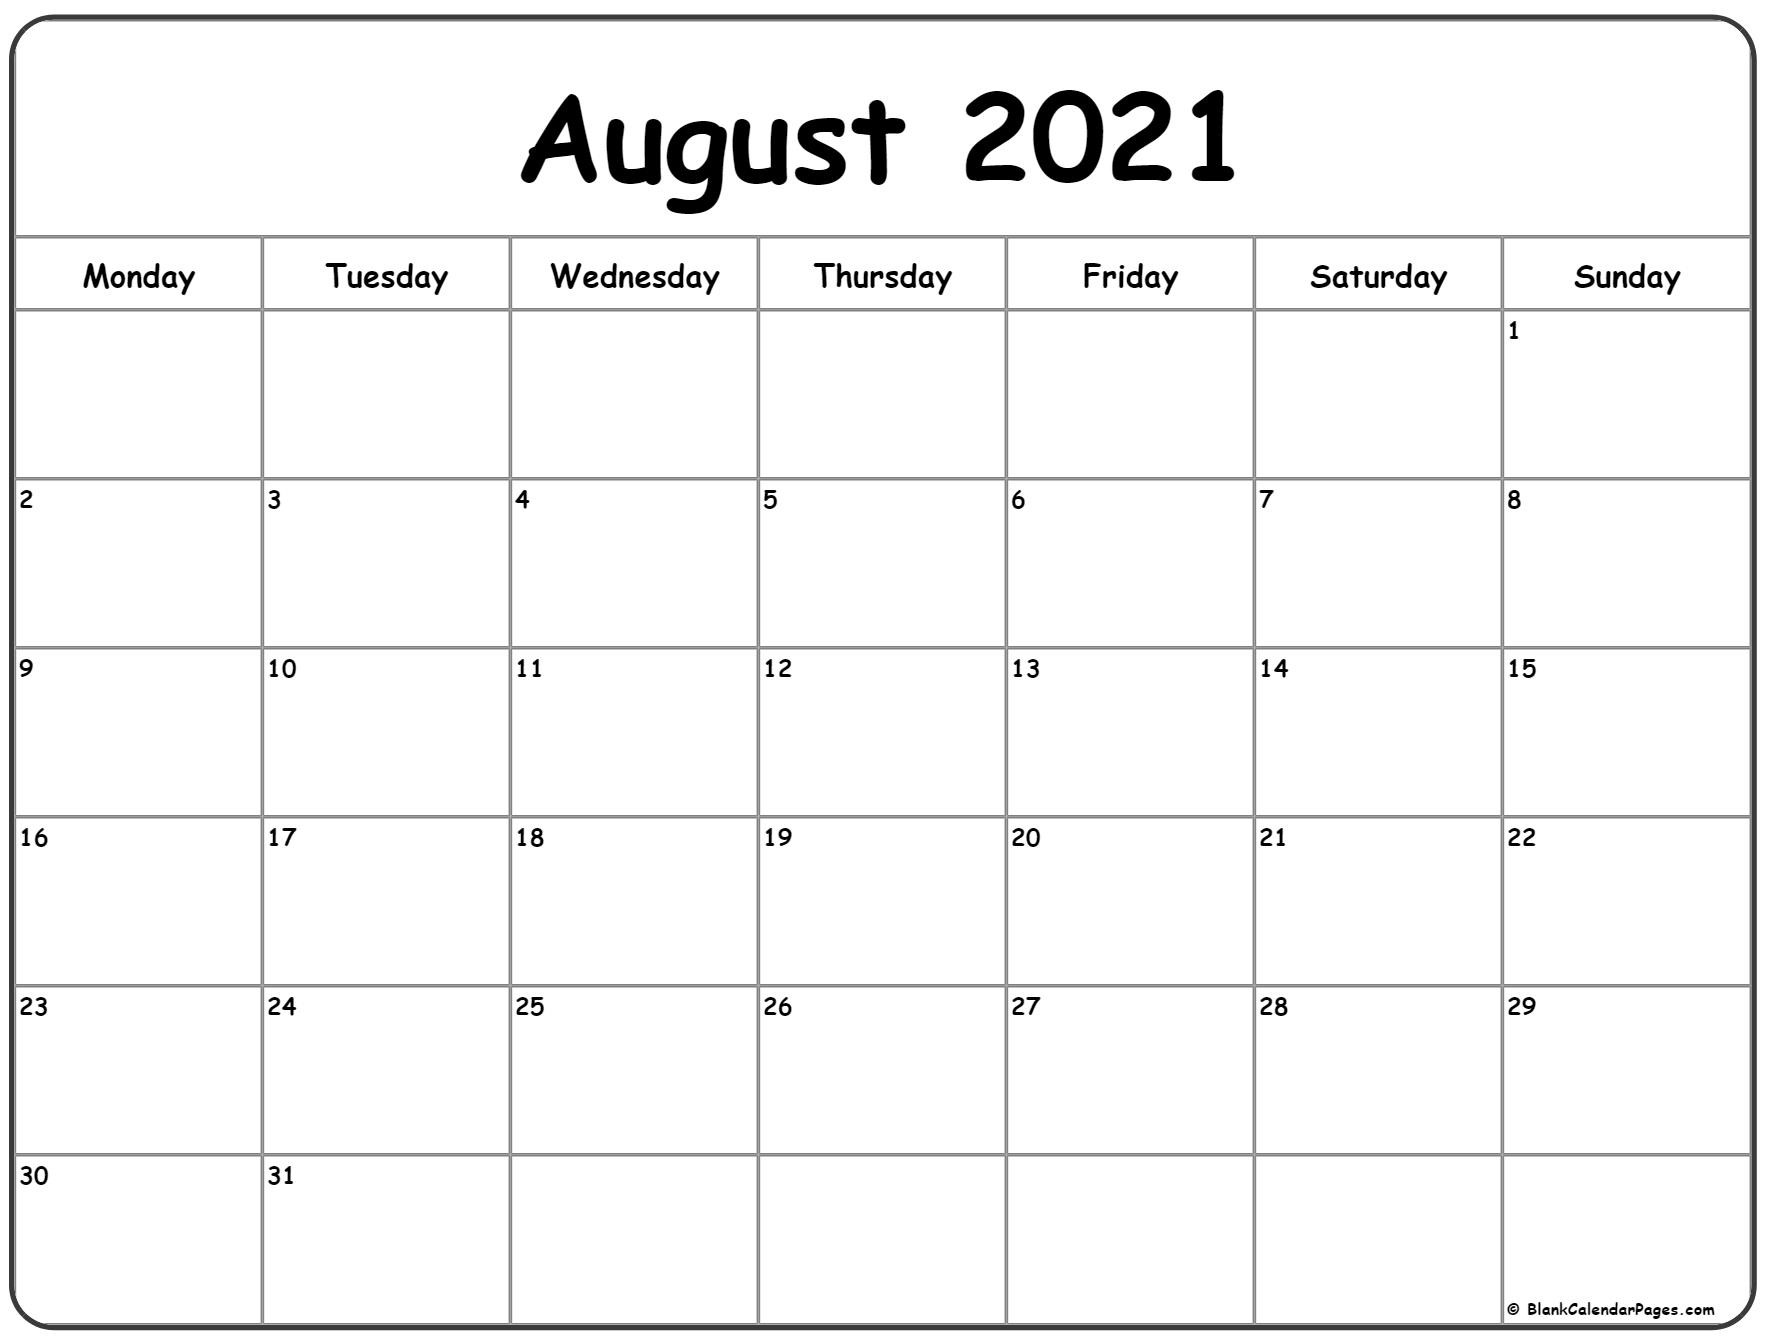 30 Beautiful Printable August 2021 Calendars For Free - Onedesblog-October Monday Thru Friday Calendar 2021